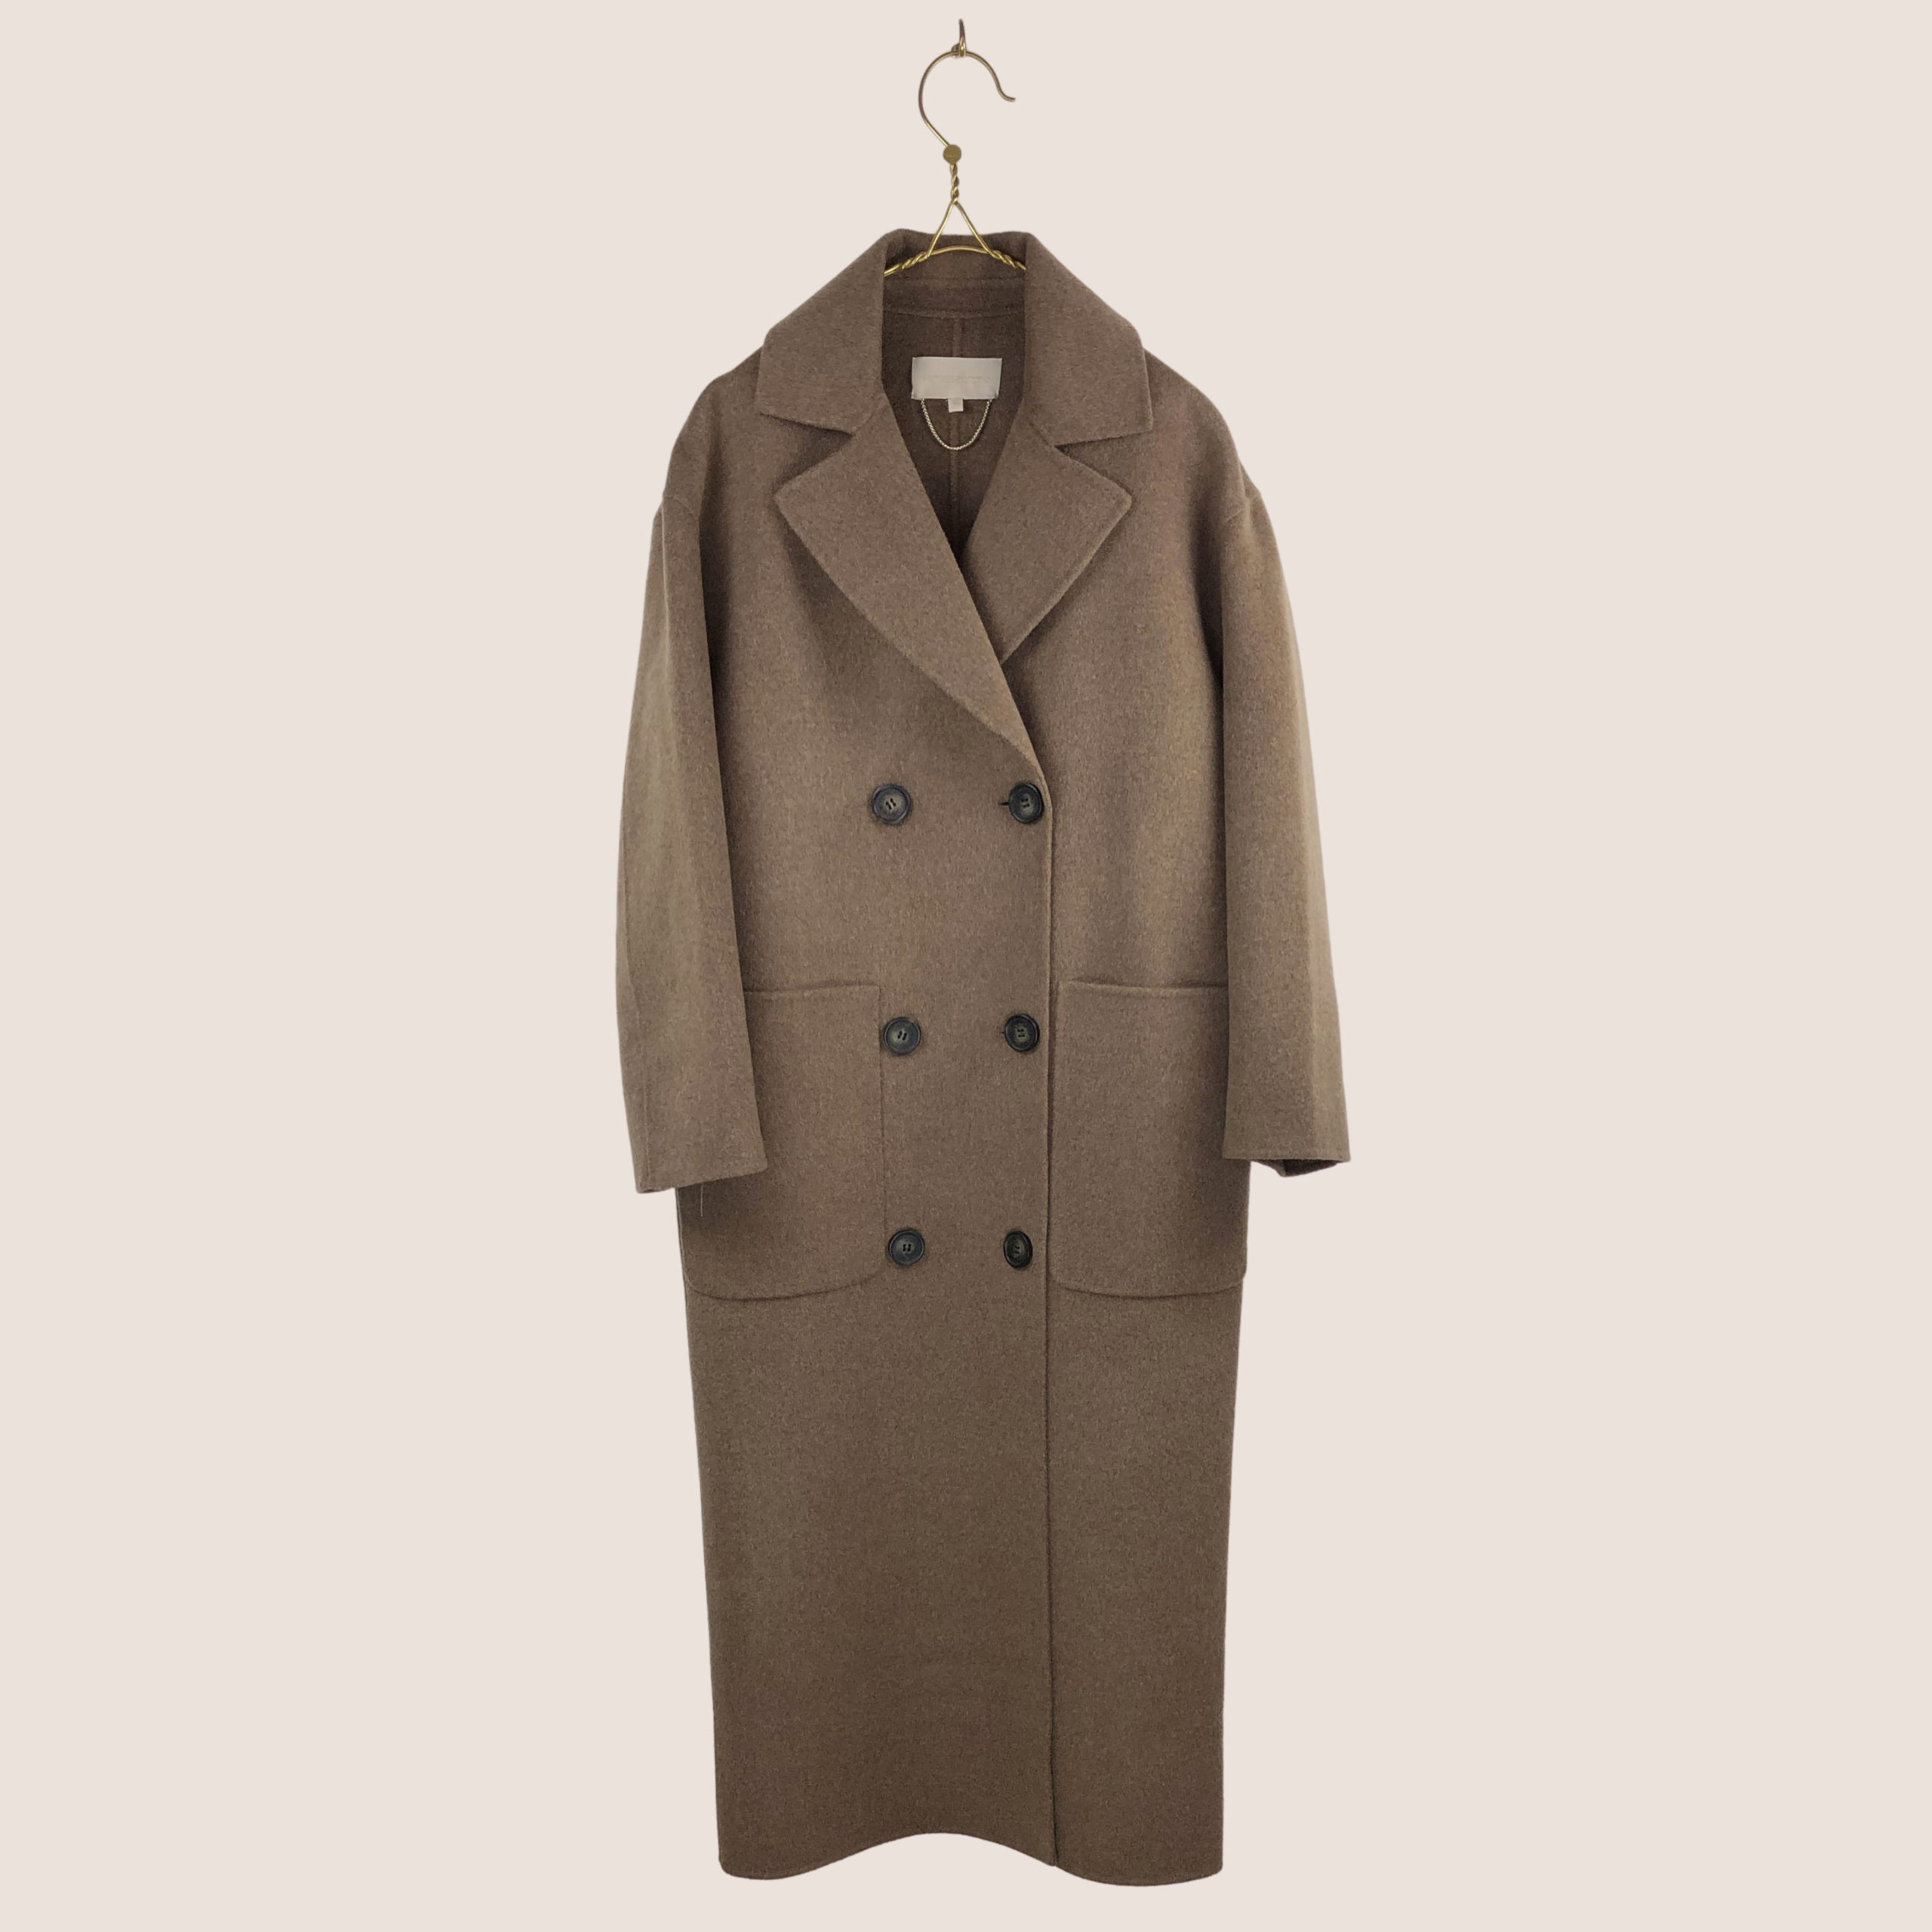 Partheo Coat